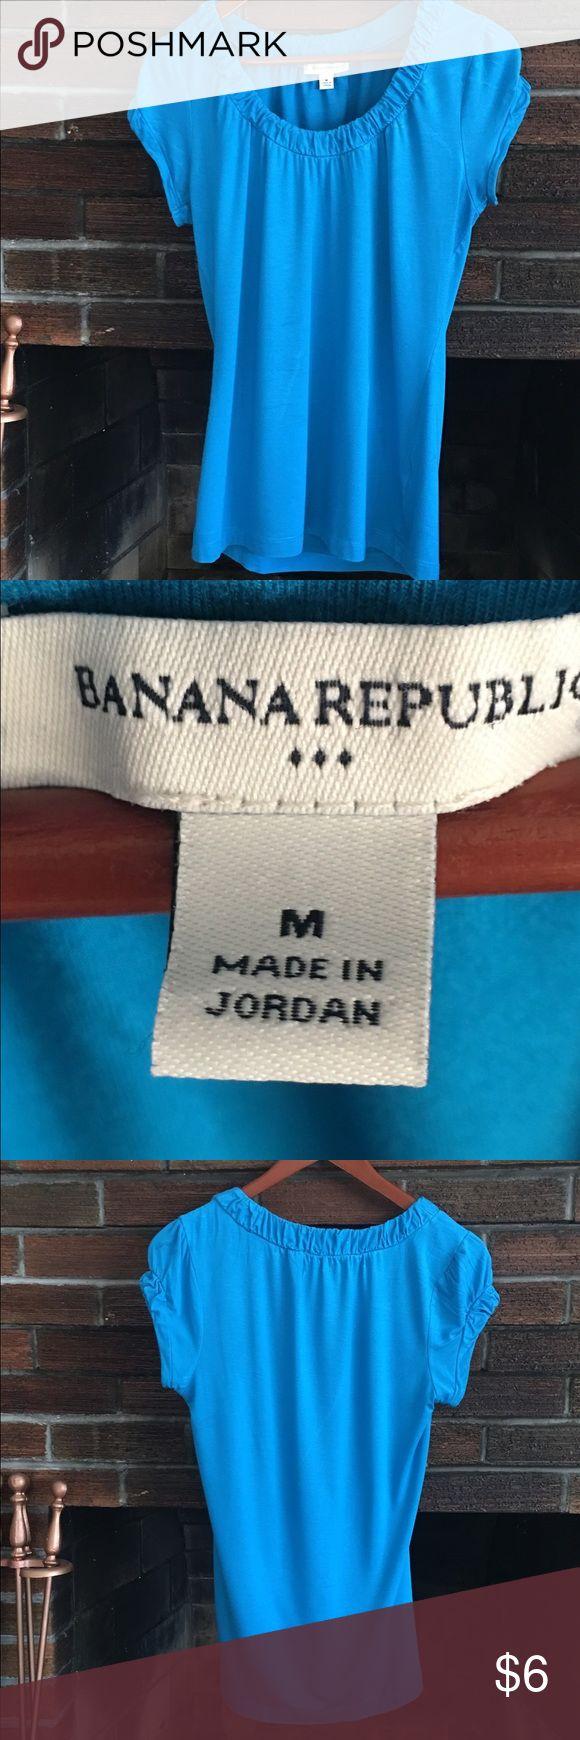 Teal Banana Republic Tshirt Teal Banana Republic Tshirt Banana Republic Tops Tees - Short Sleeve